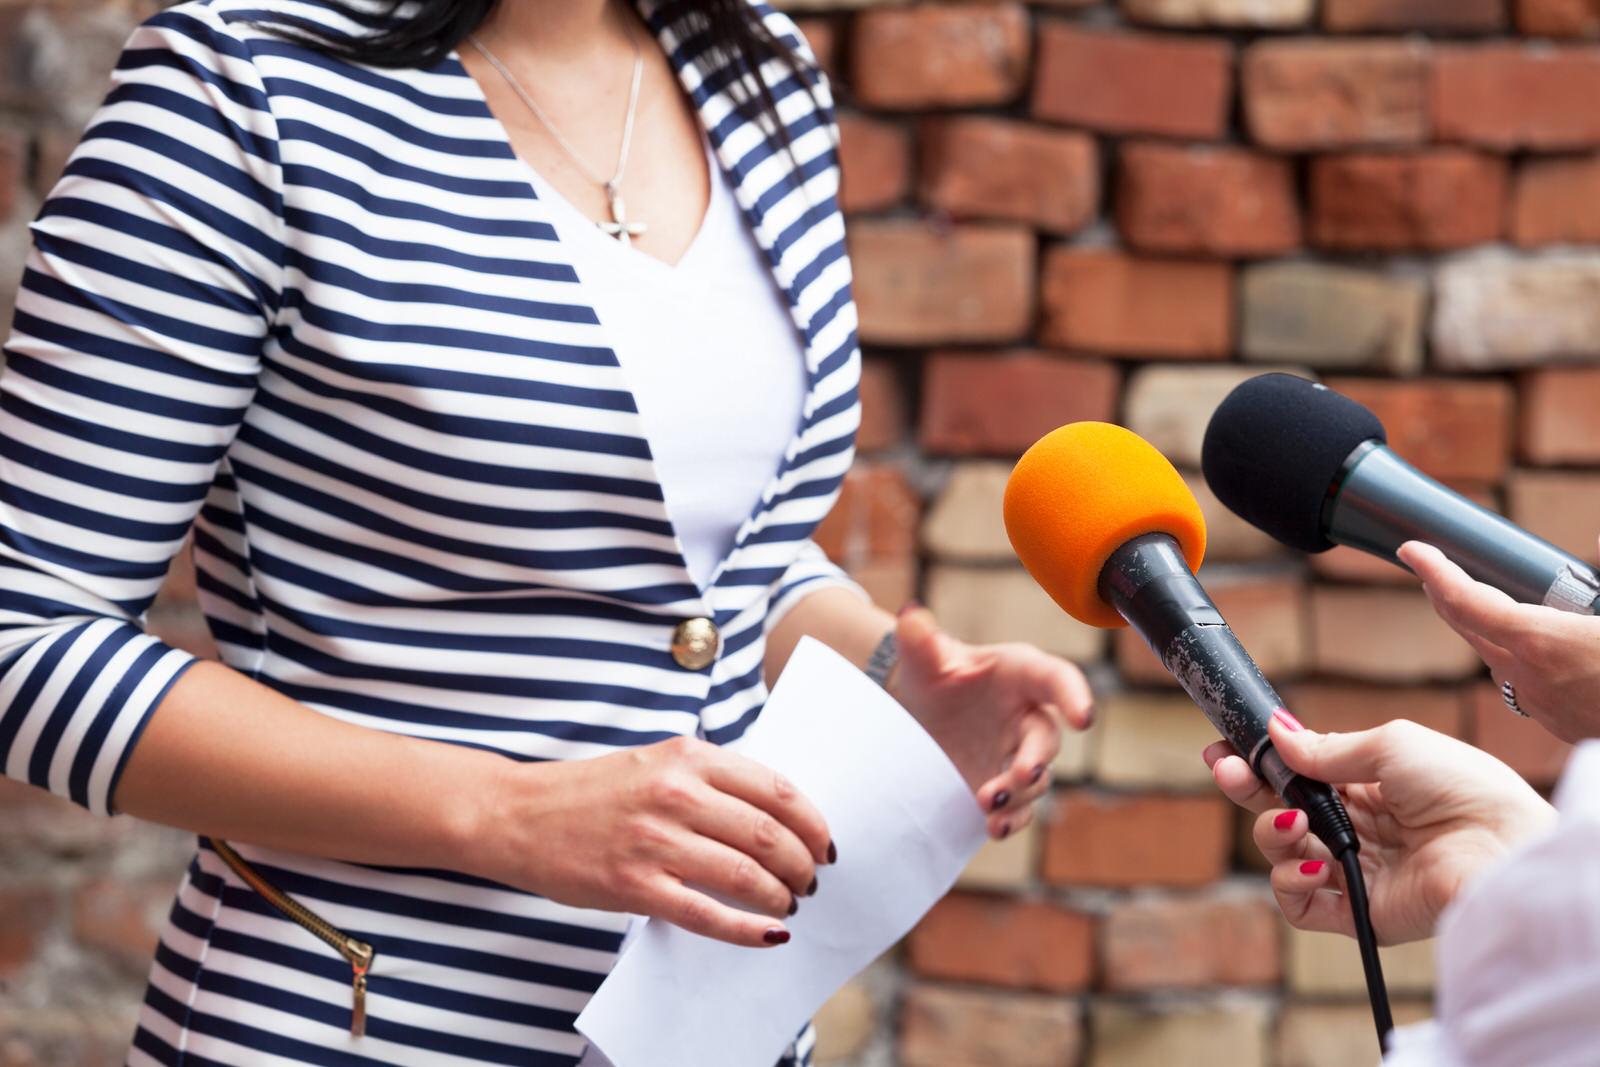 Woman at press conference